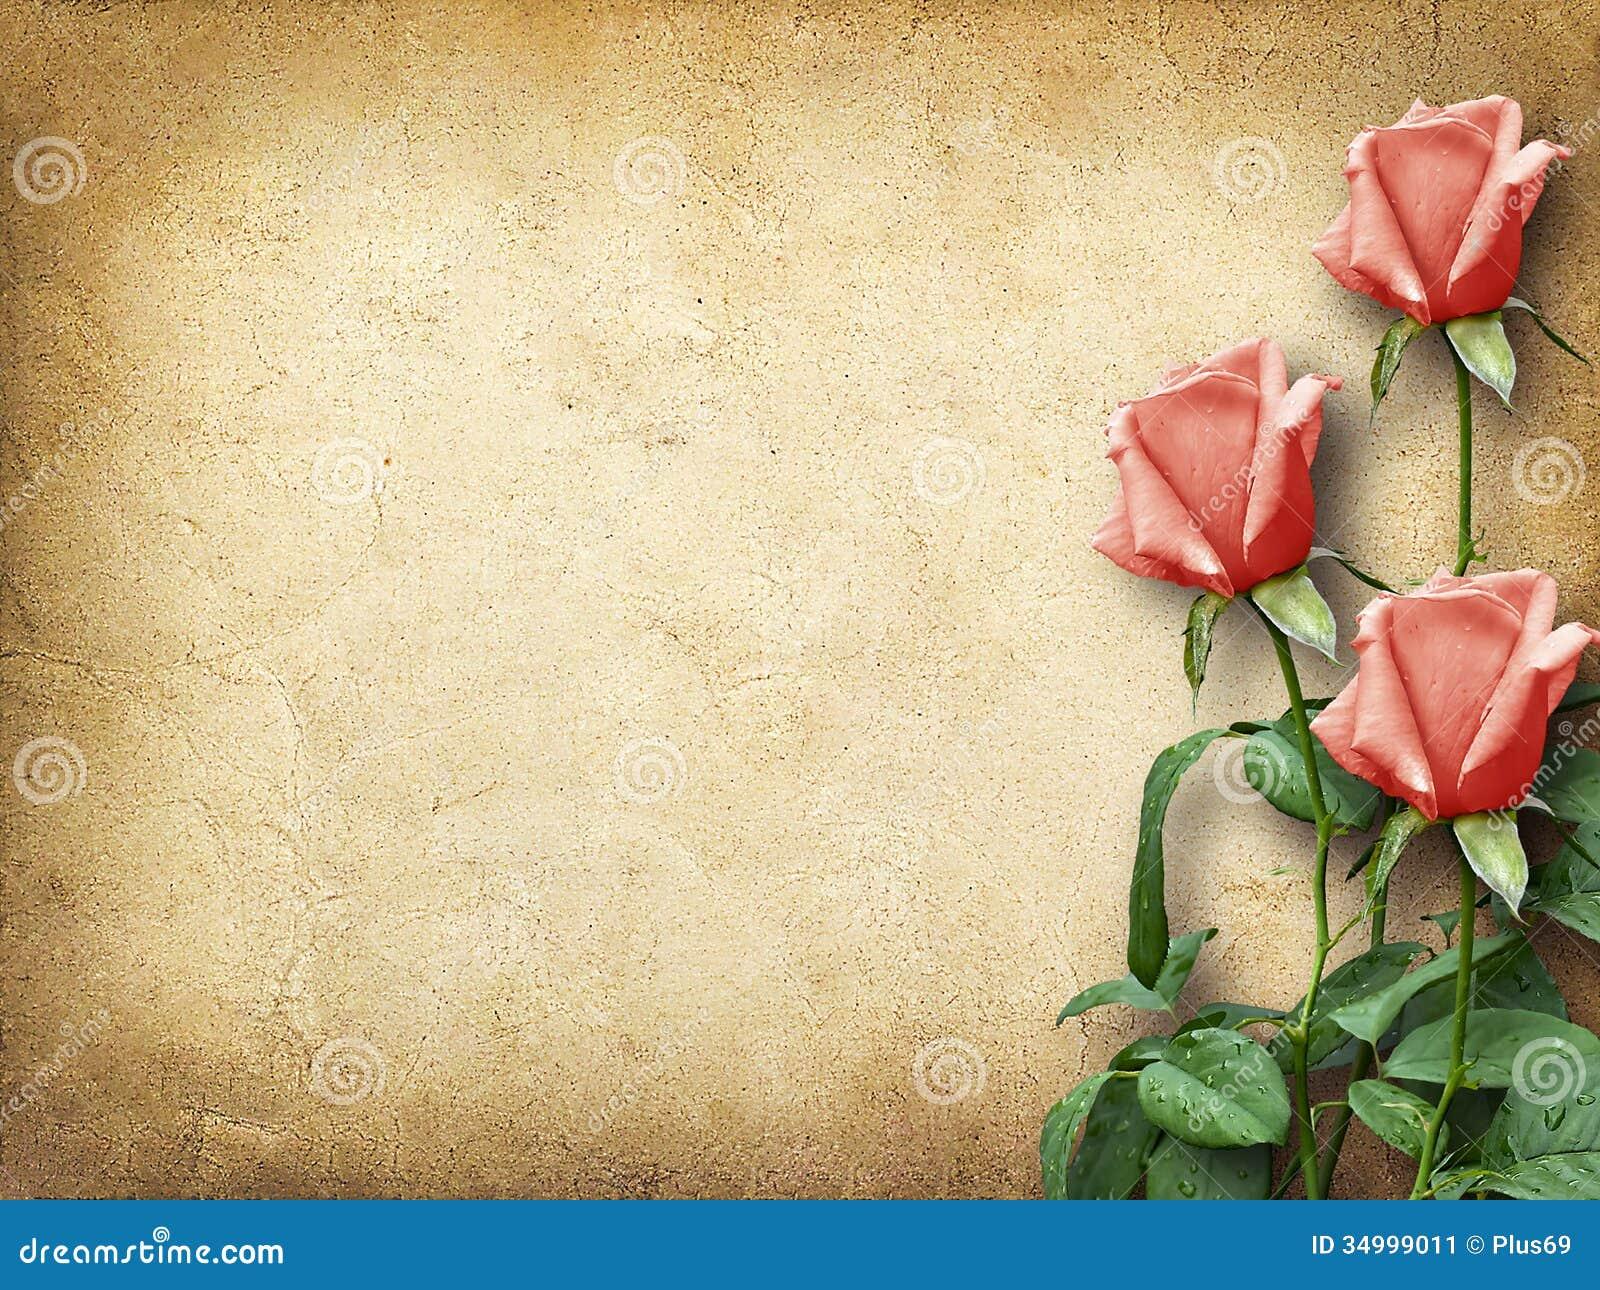 Fotos de rosas Las rosas de flores, rosas fotos, fondos de